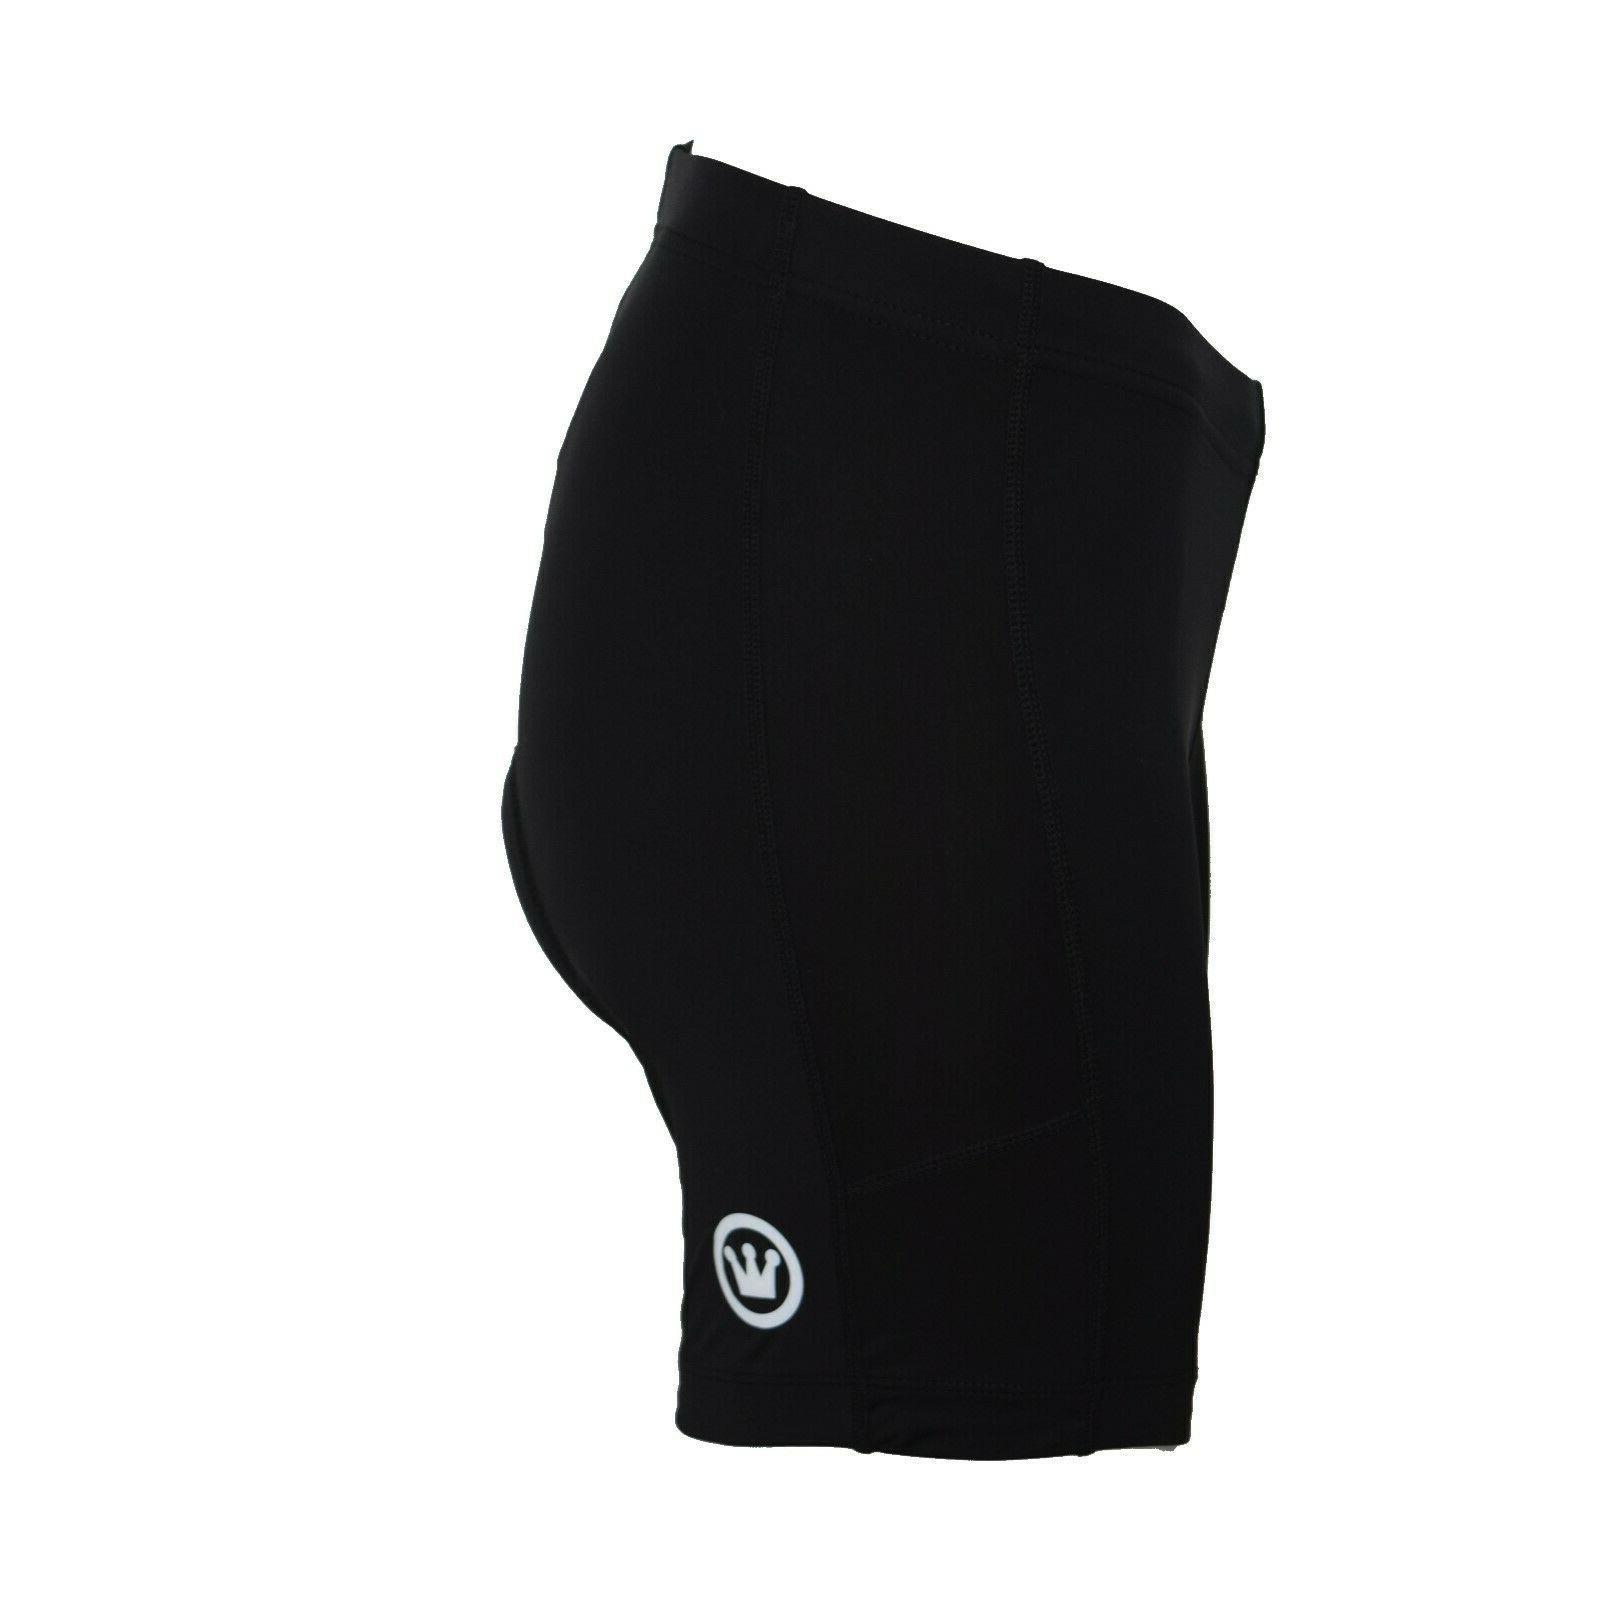 CANARI Shorts Black Bike Spandex Large NWT